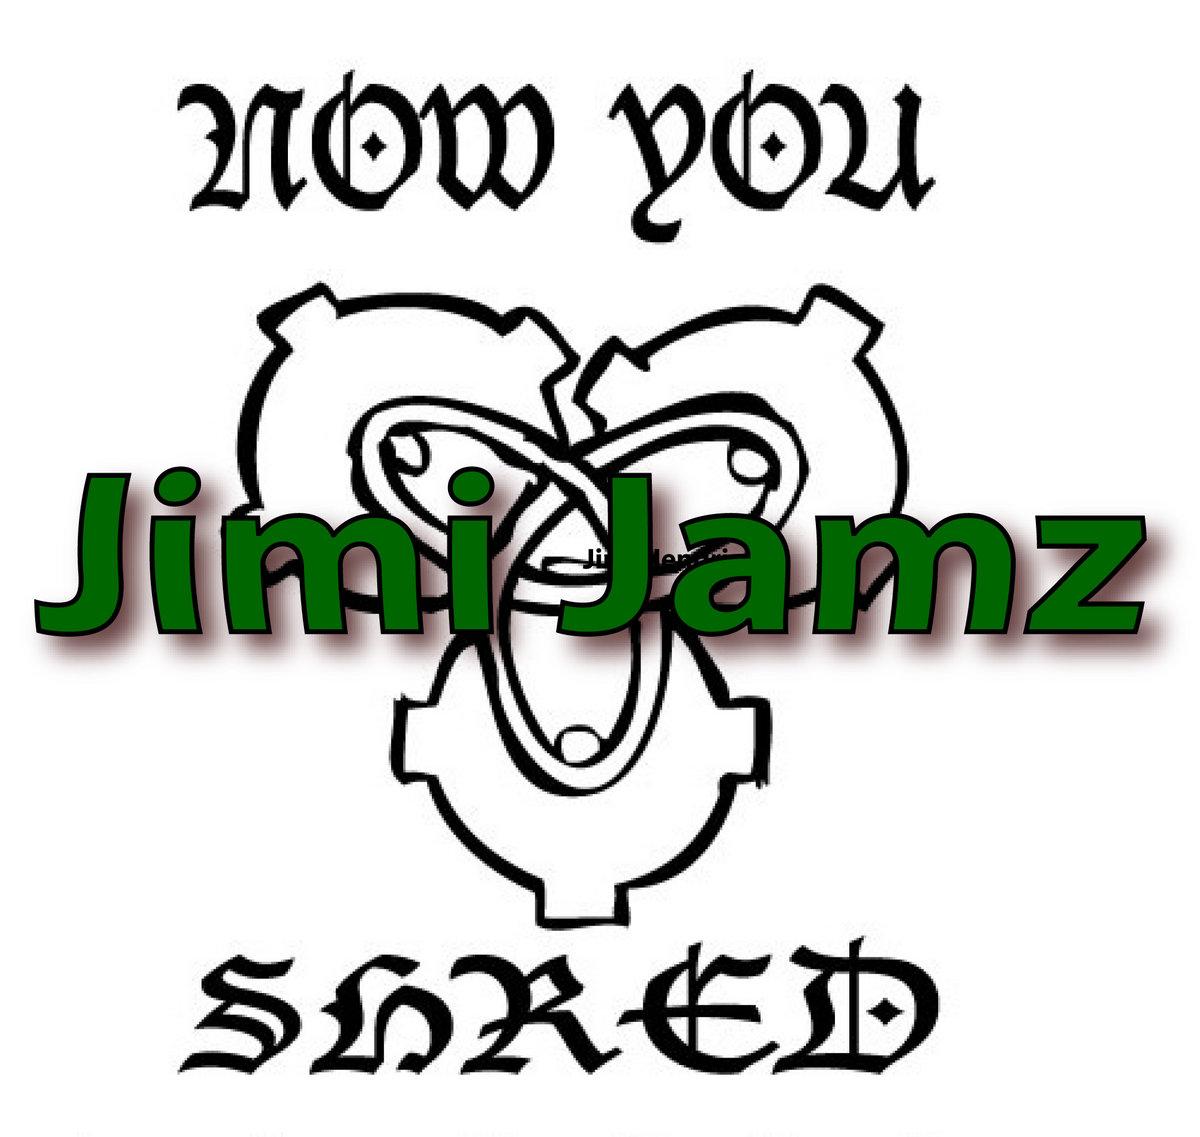 JIMI JAMZ Backing Tracks for Play Along | Now YOU Shred